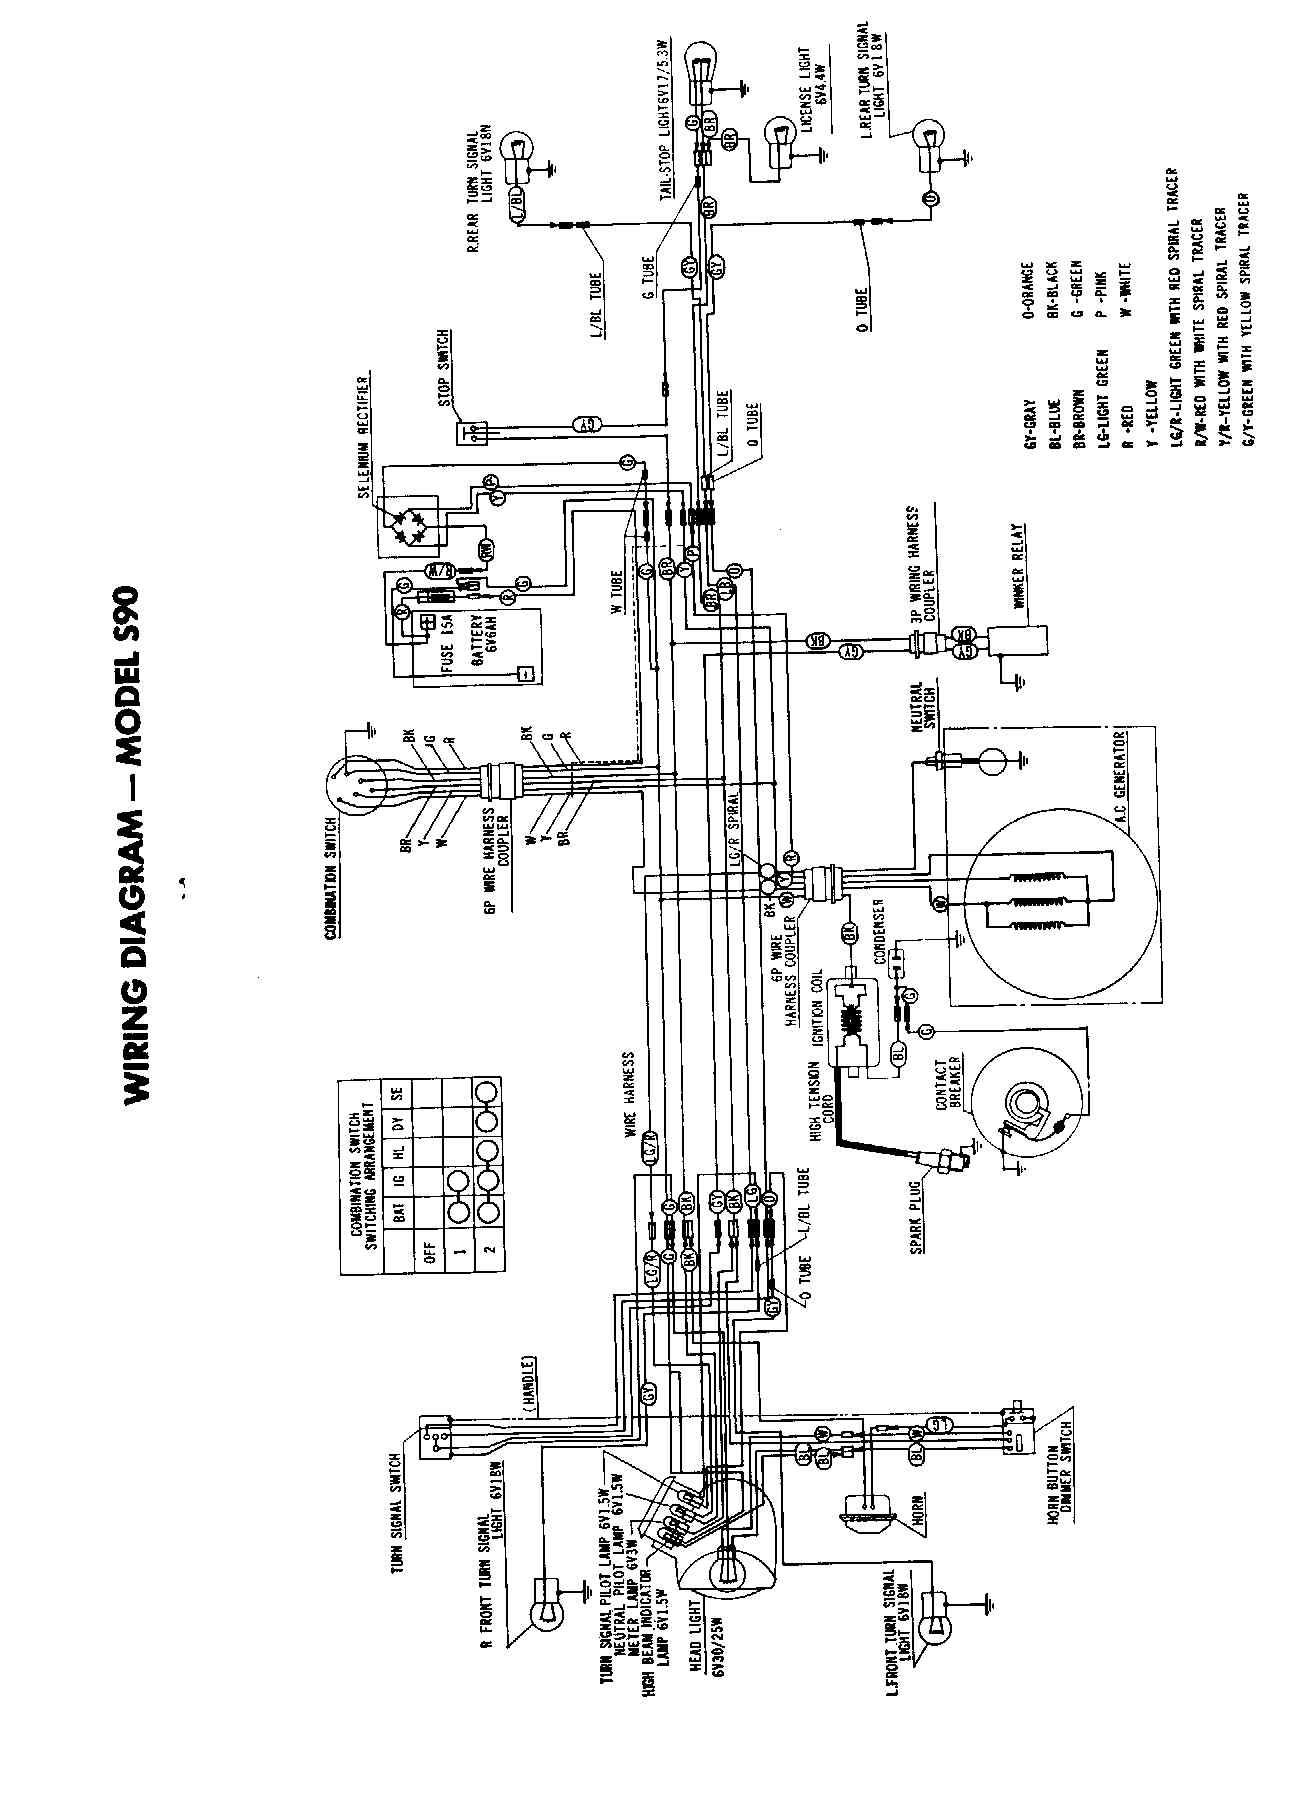 Honda Xr200 Wiring Harness Diagram - Wiring Diagram Liry on